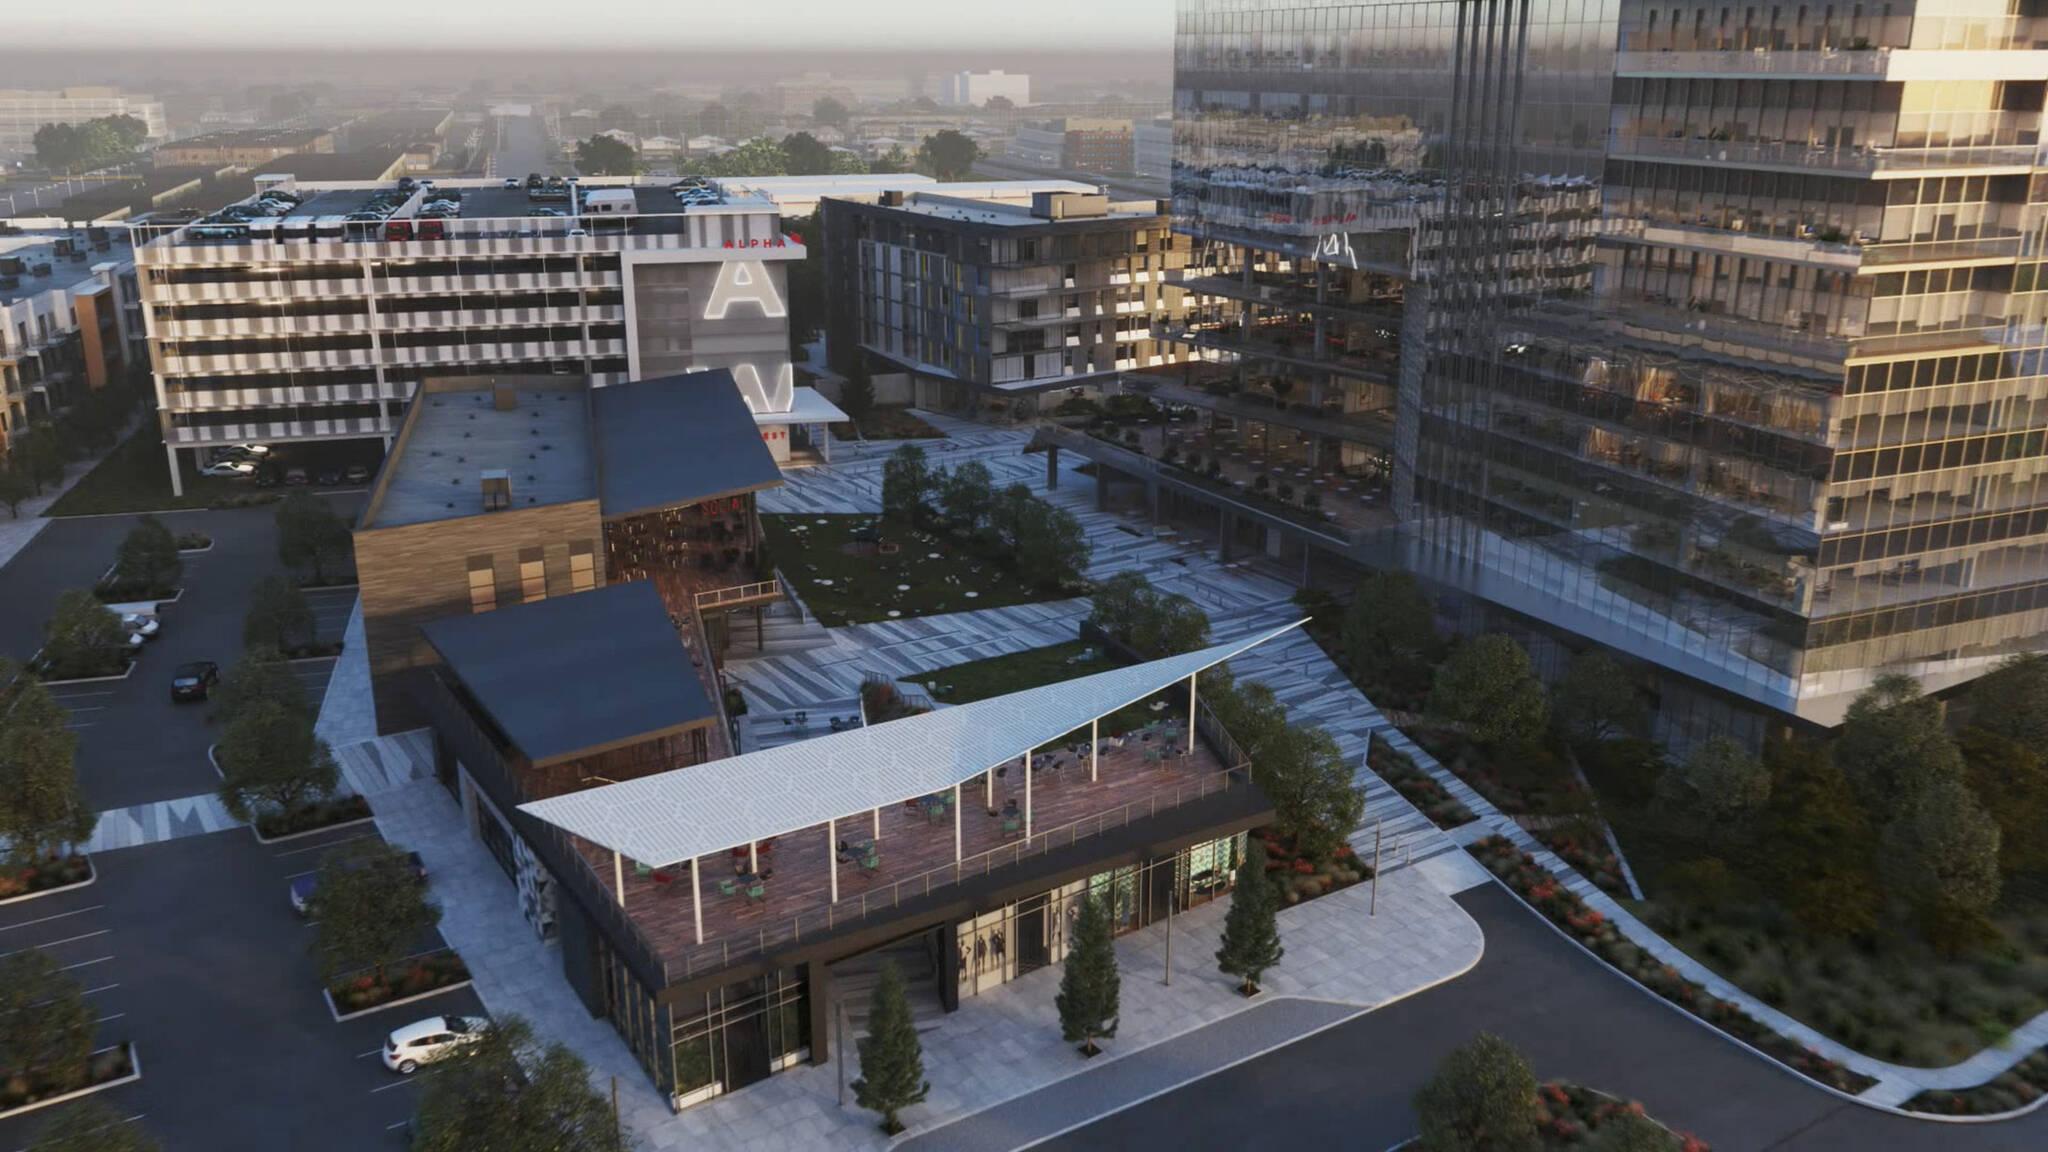 Dallas Alpha West mixed-use complex project located in Dallas, Texas designed by the architecture studio Danny Forster & Architecture